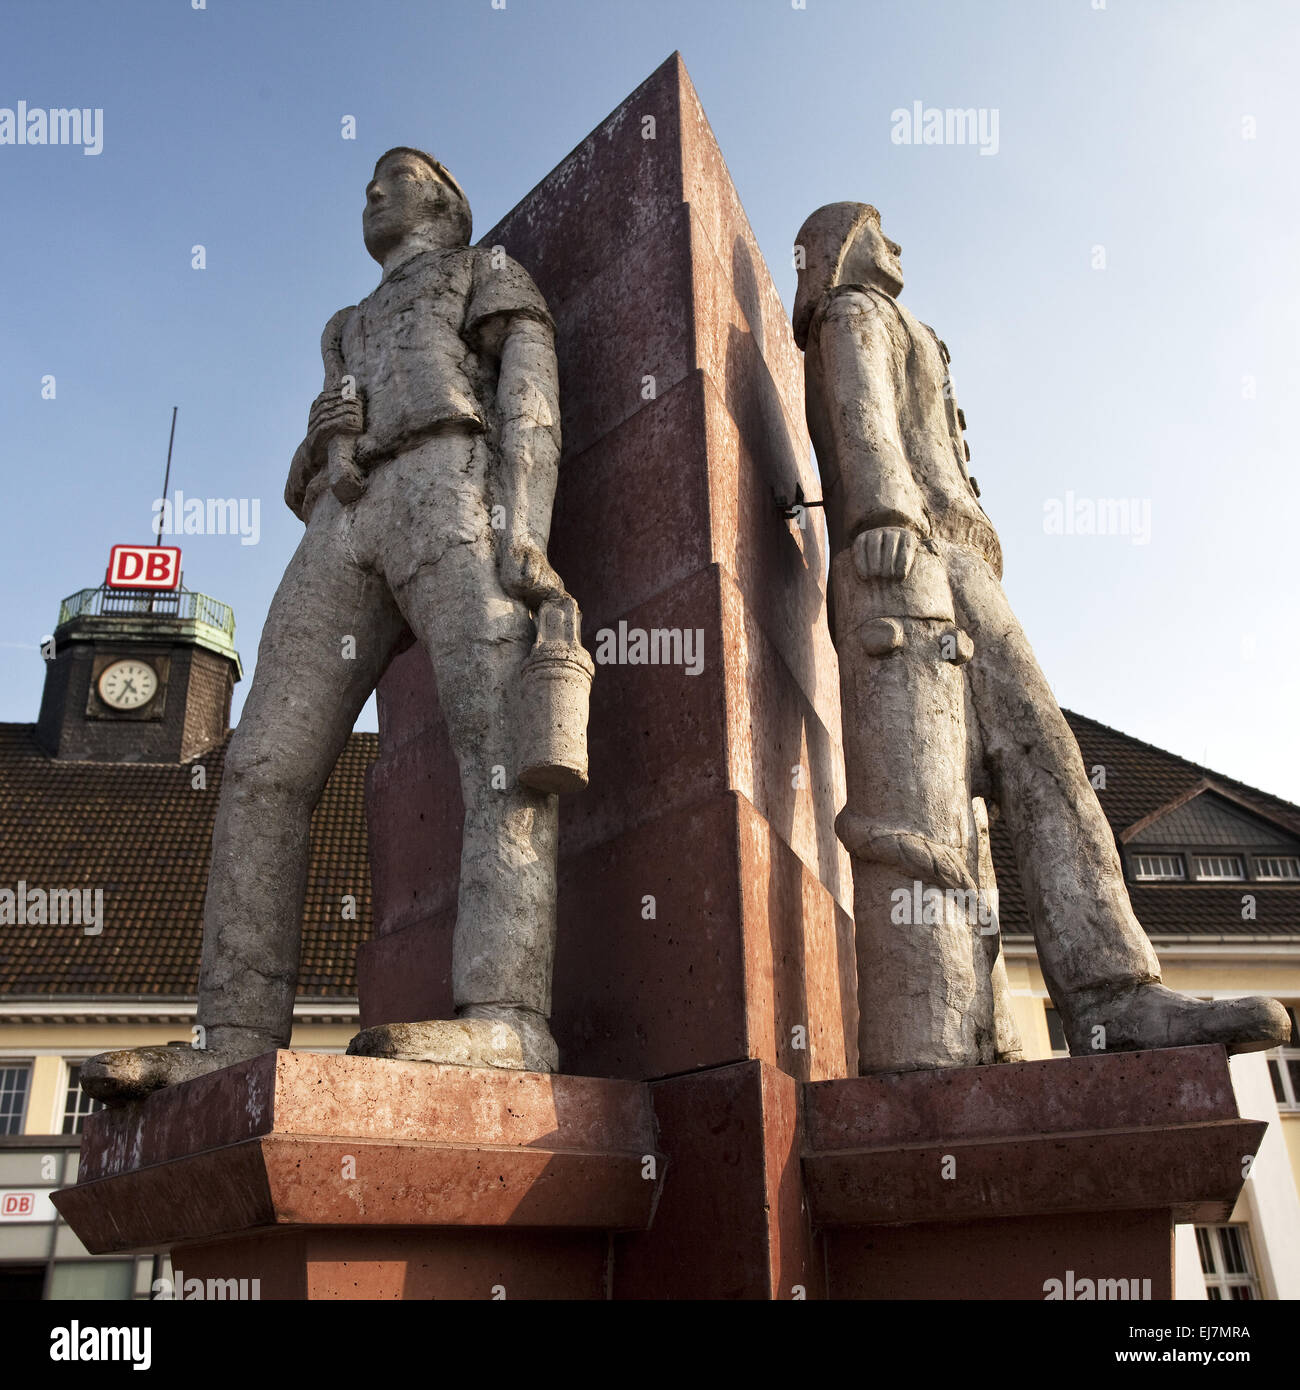 Three men Corner, Herne, Germany - Stock Image